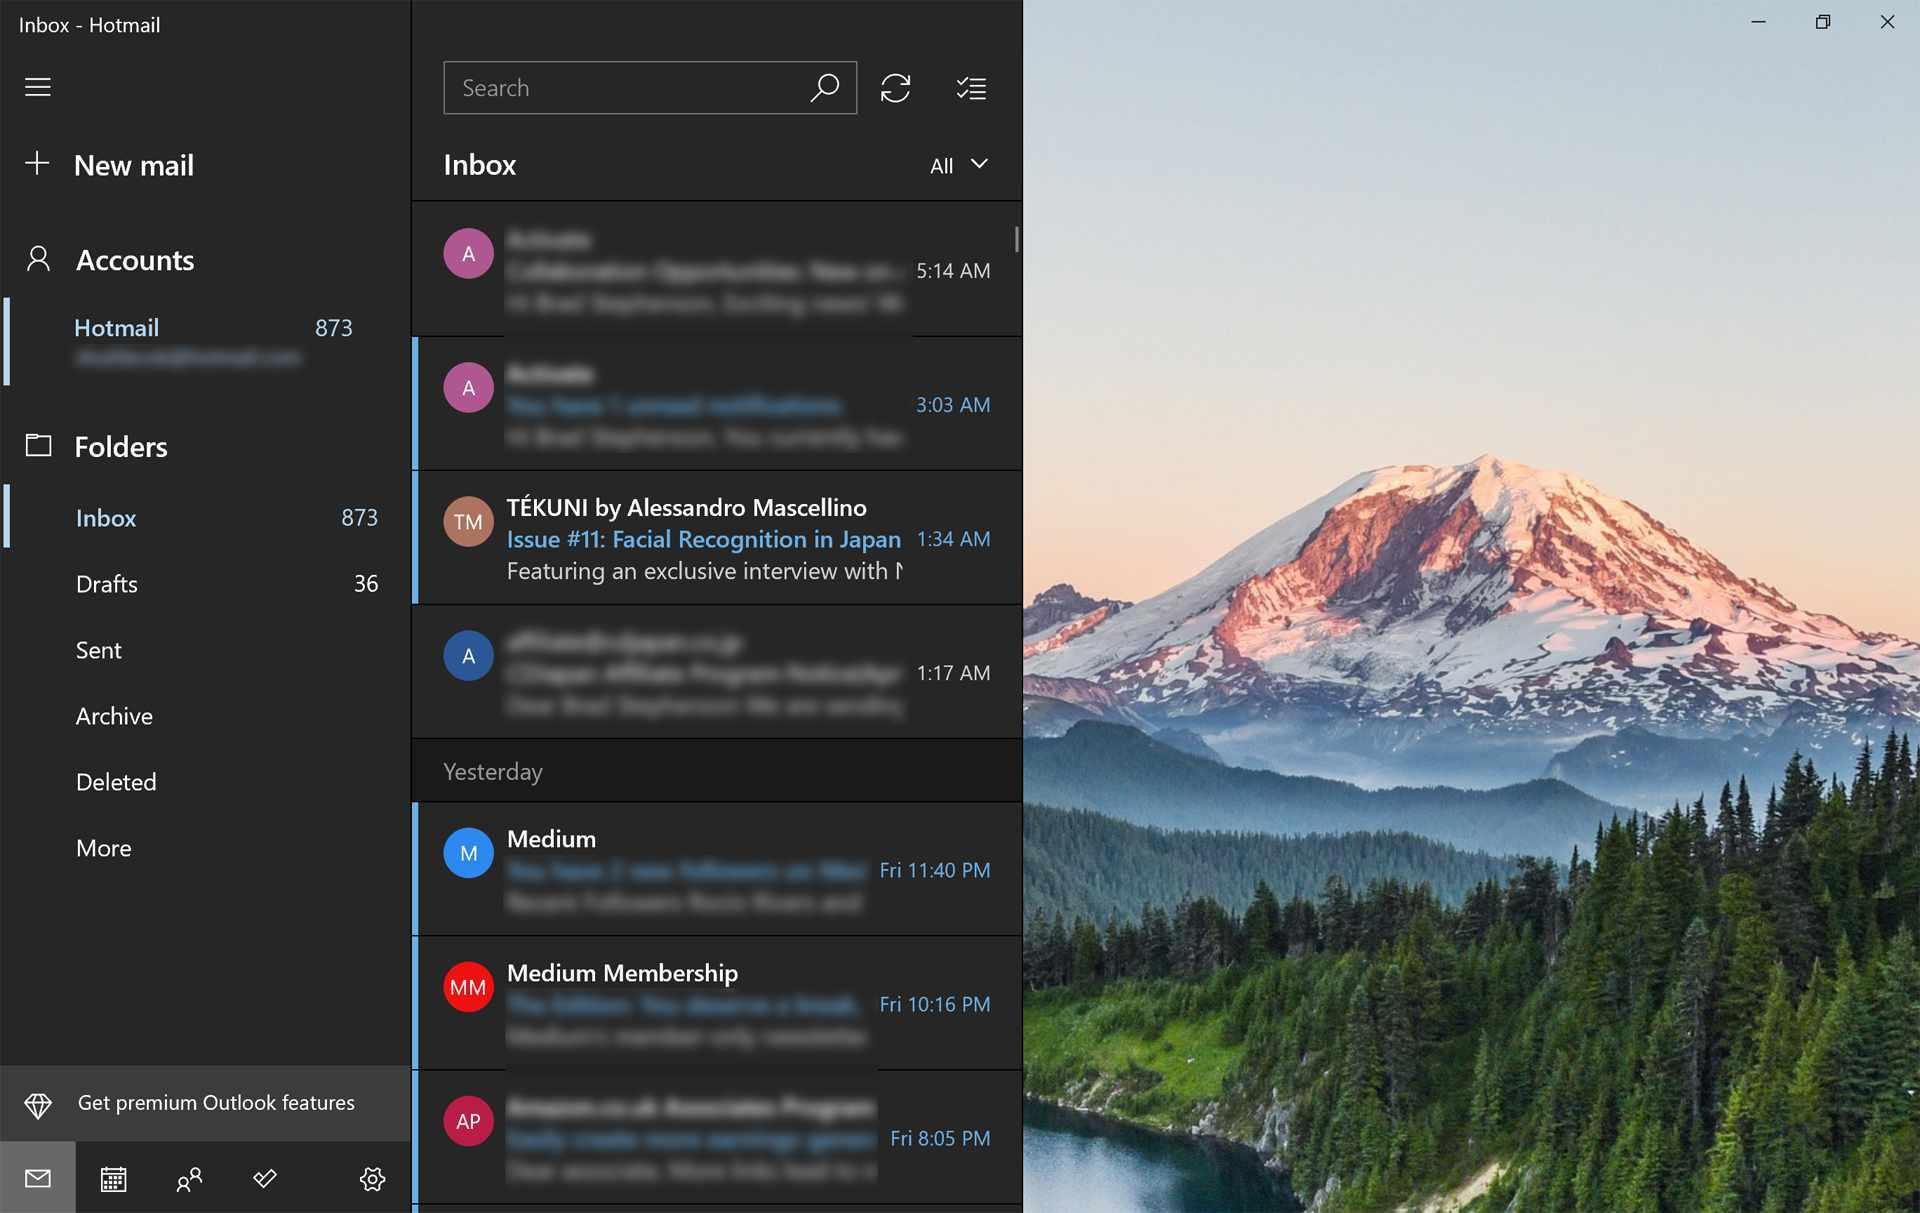 Windows 10 Mail app on Surface Pro 7.